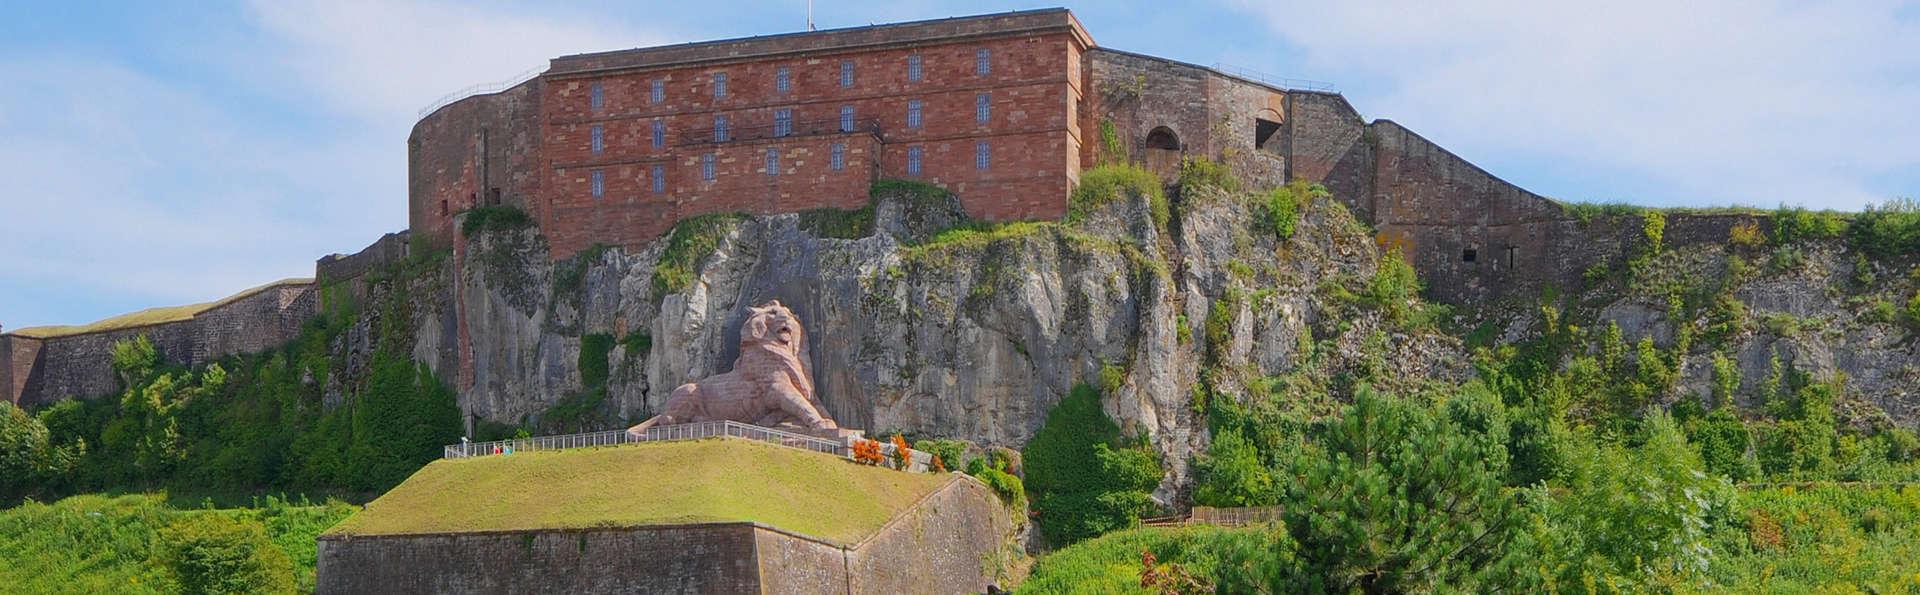 Escapade aux portes de la ville de Belfort